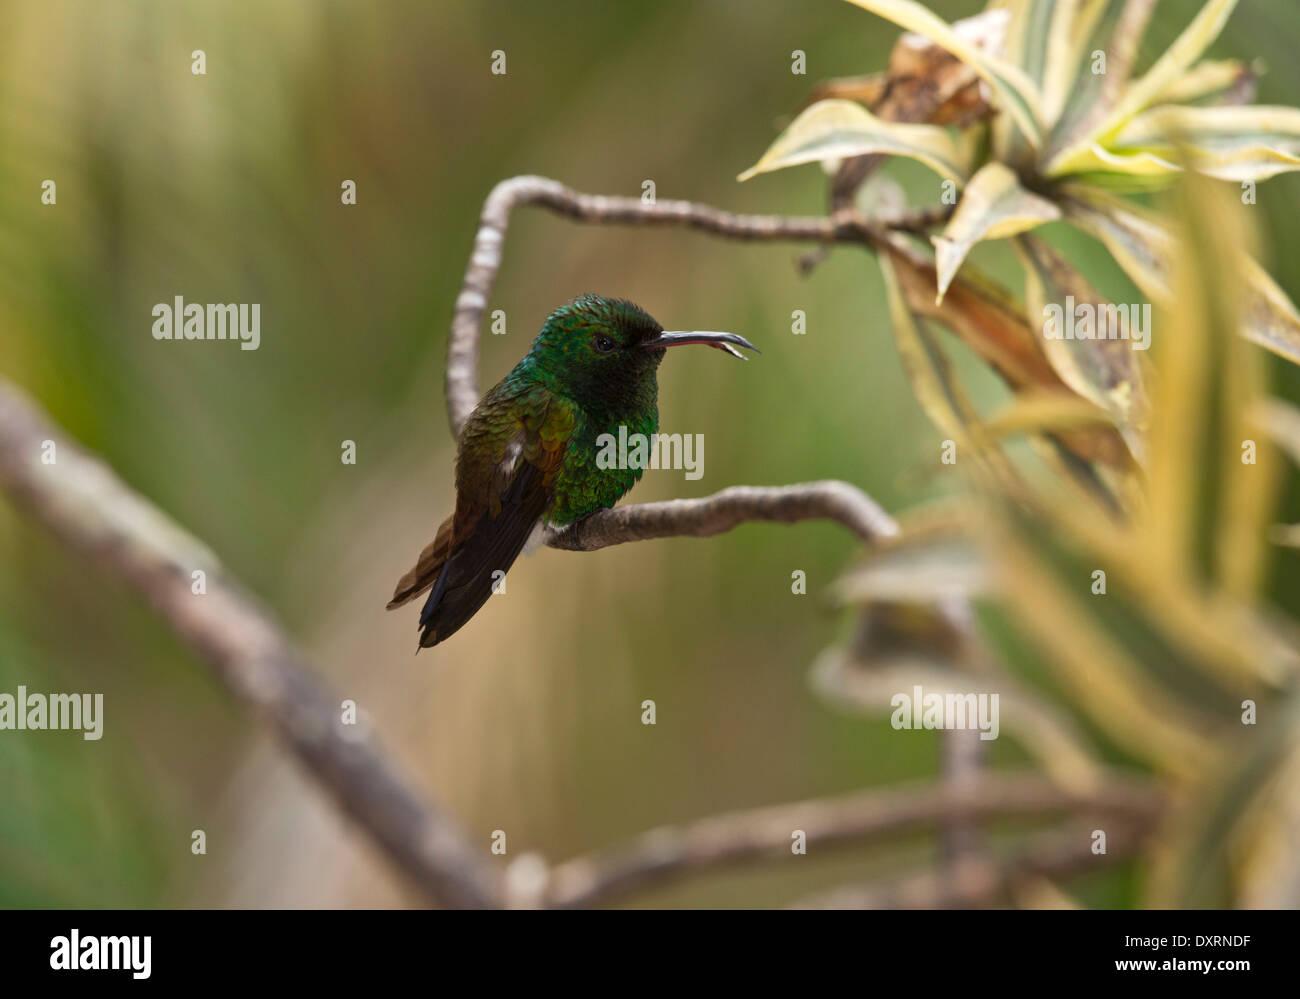 Copper-rumped Hummingbird, Amazilia tobaci erythronotus perched, with deformed beak. Trinidad. - Stock Image